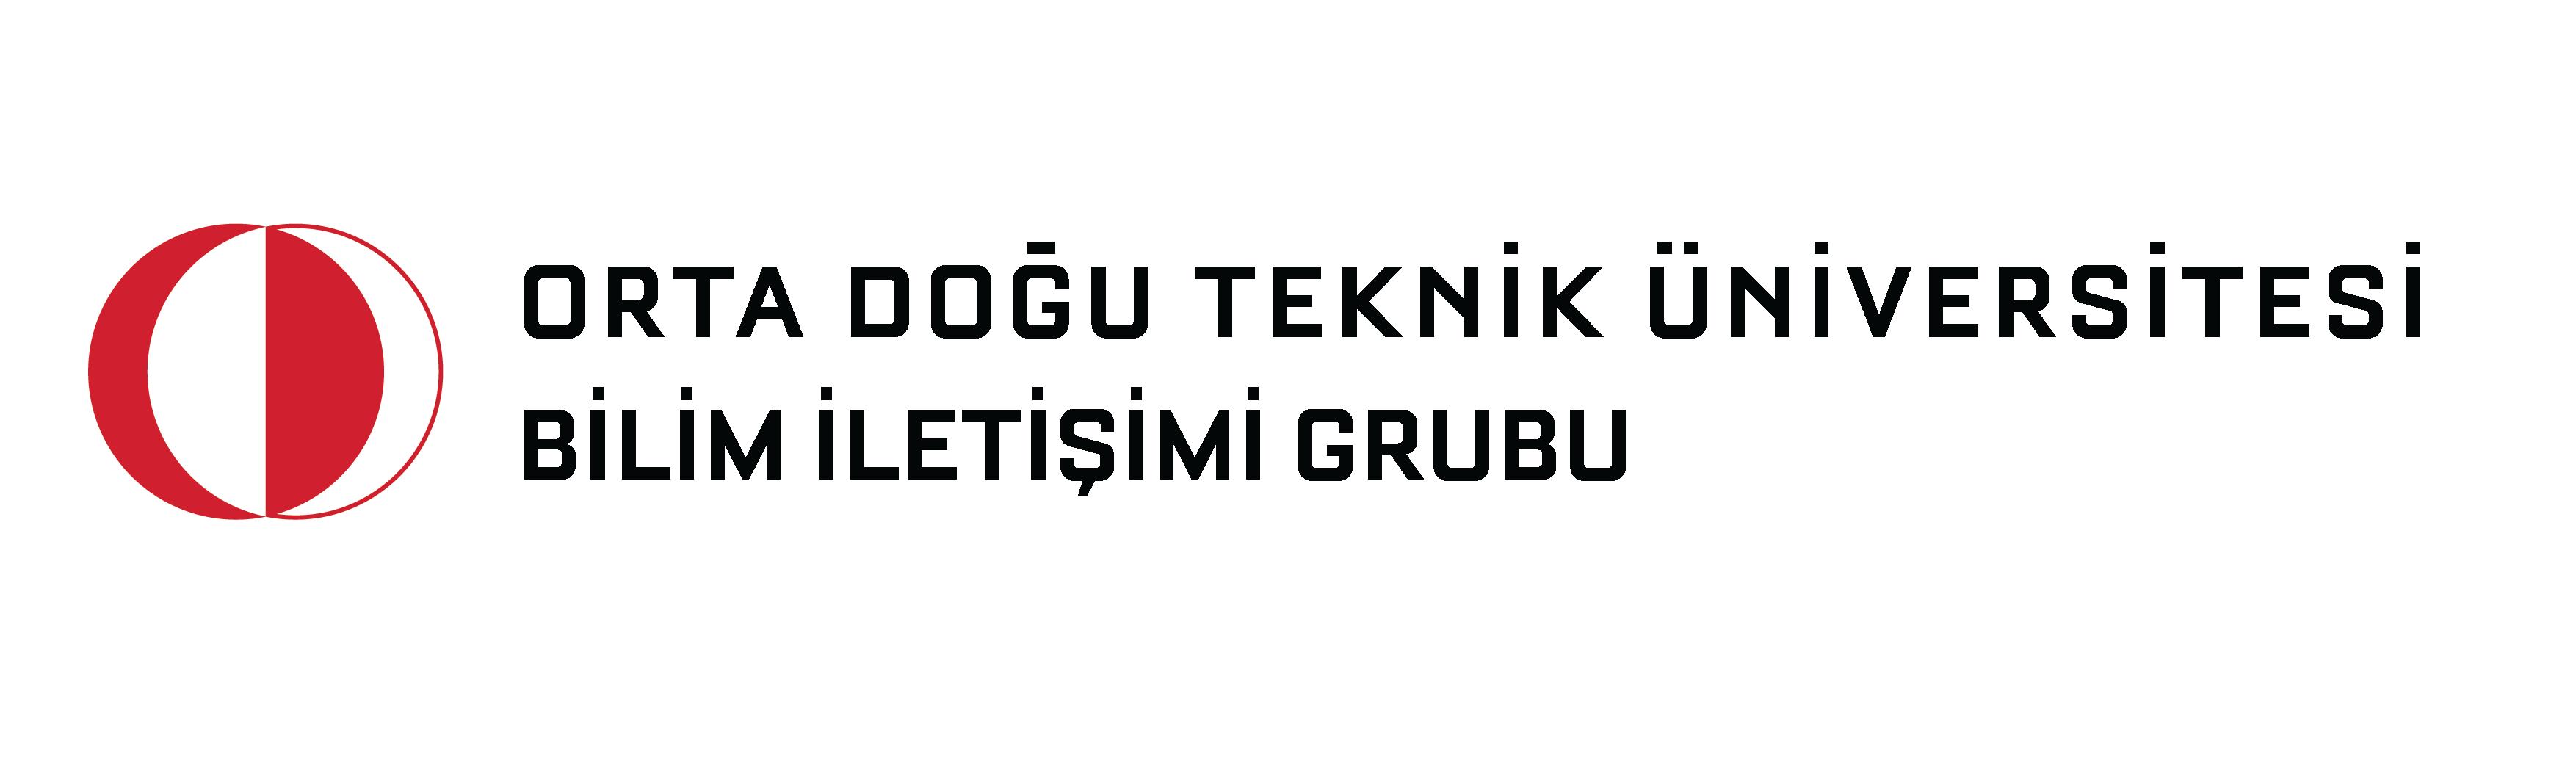 ODTÜ Bilim İletişimi Grubu